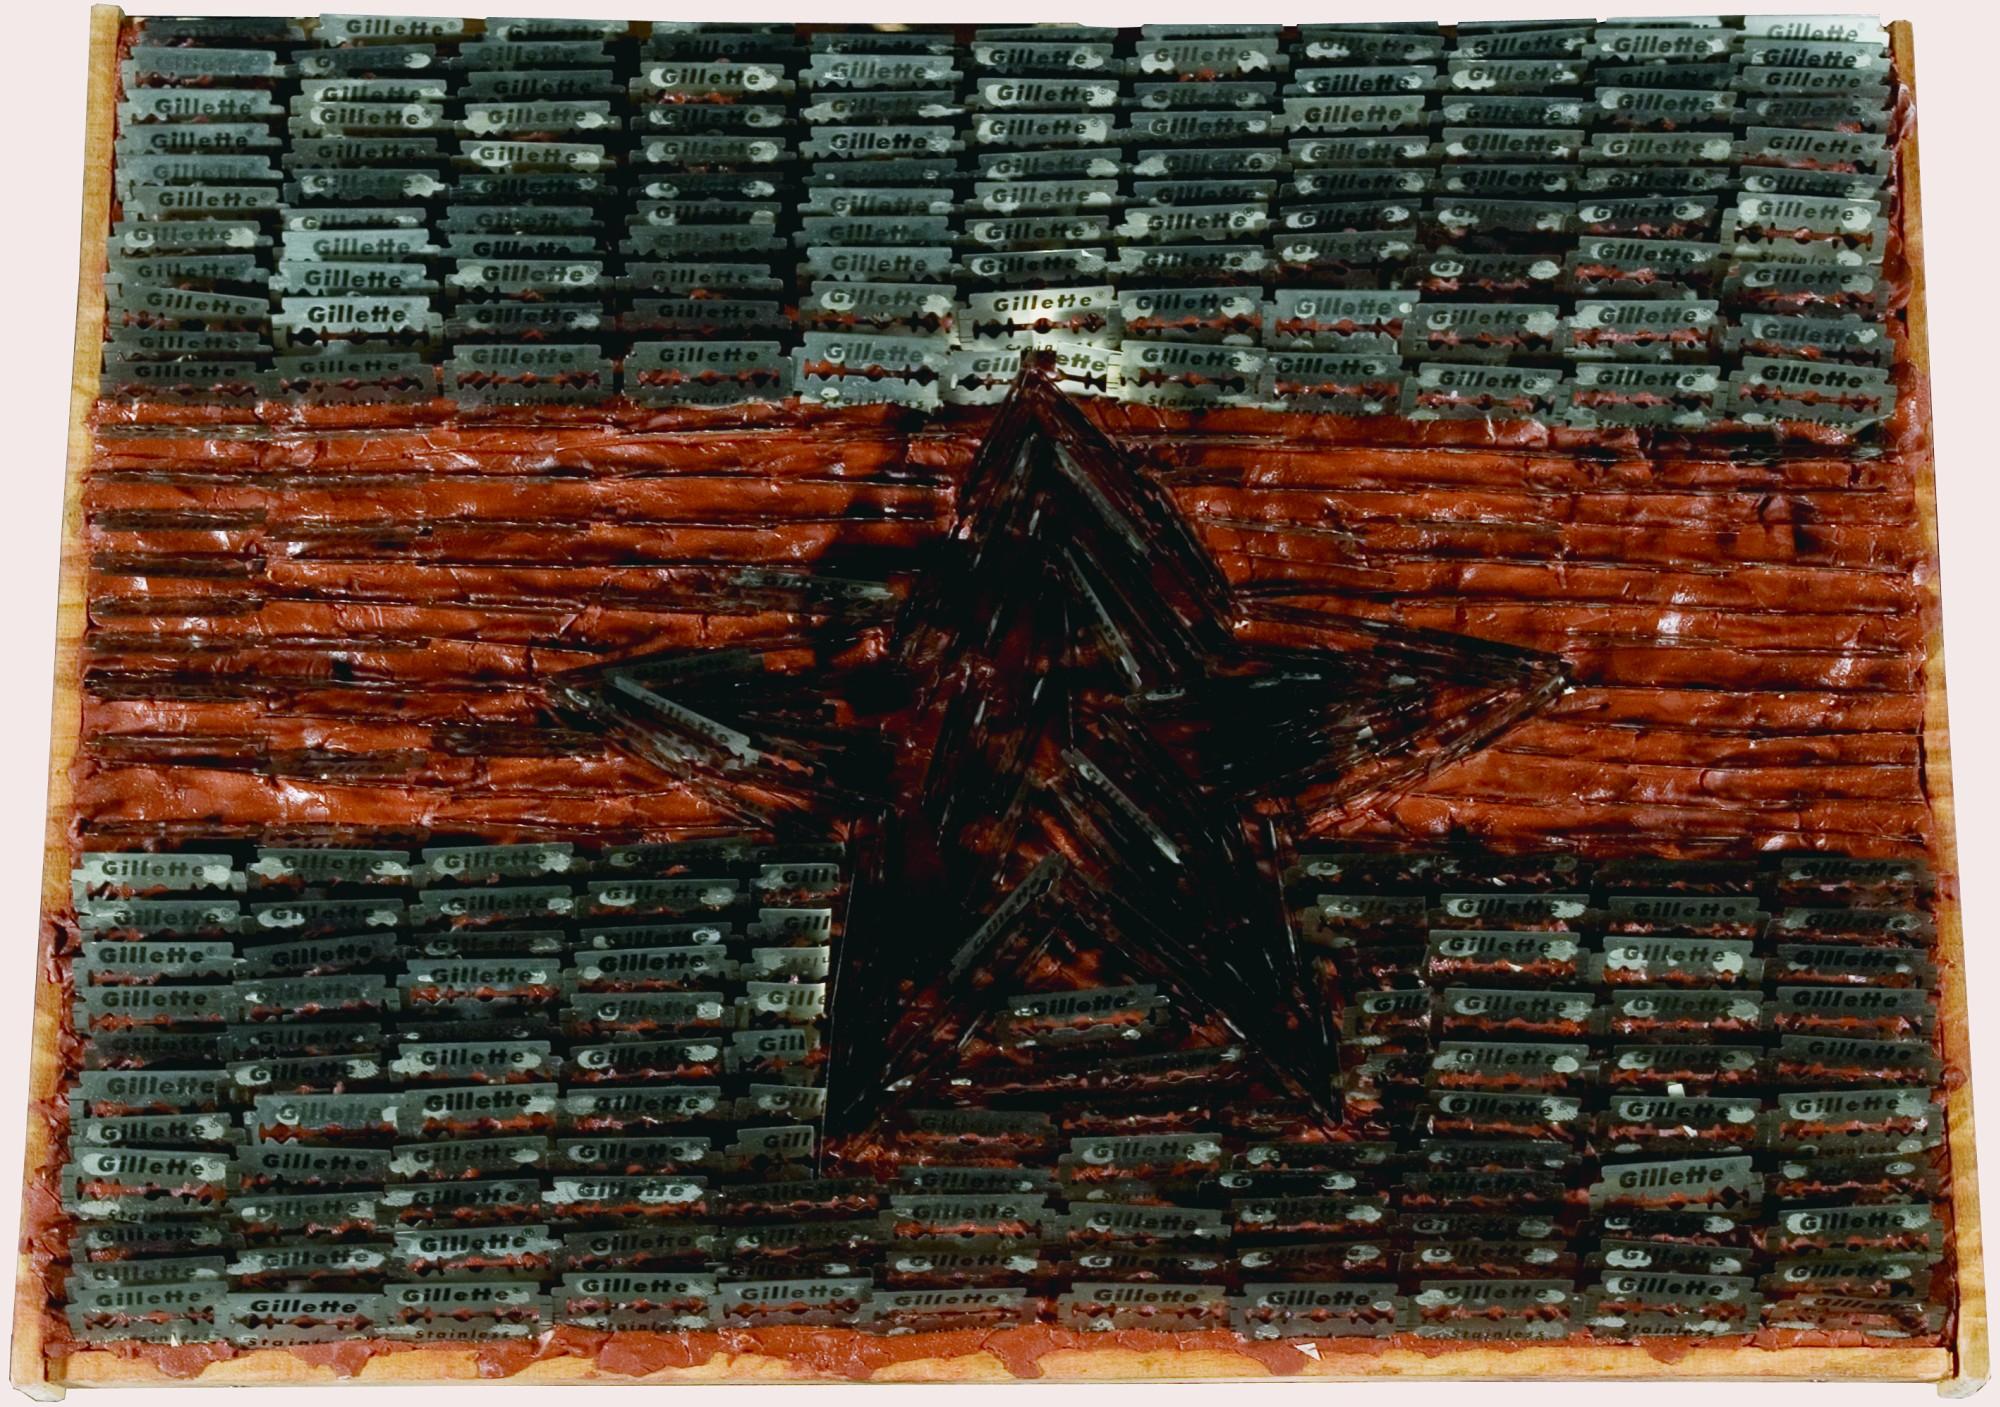 Sven Stilinović, Flag, 198485, mixed media, 350 x 470 mm.